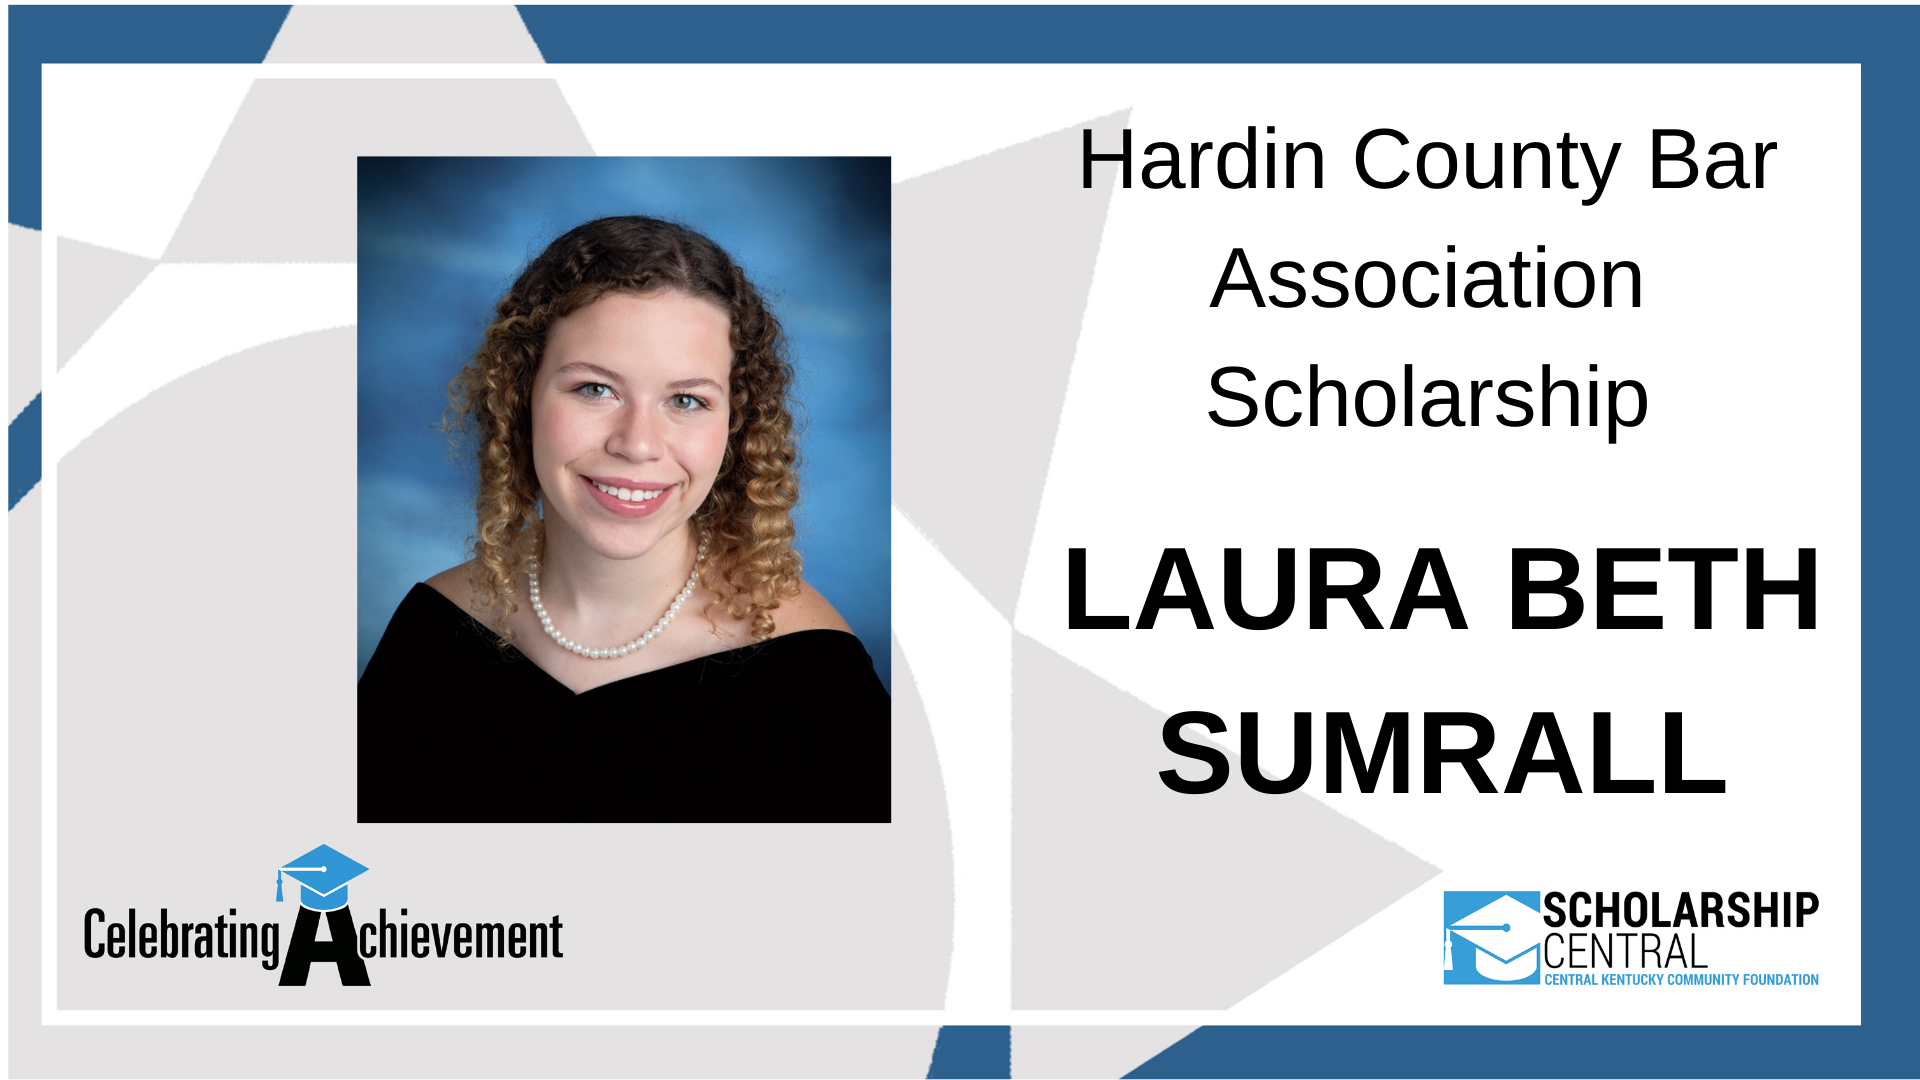 Hardin County Bar Association Scholarship